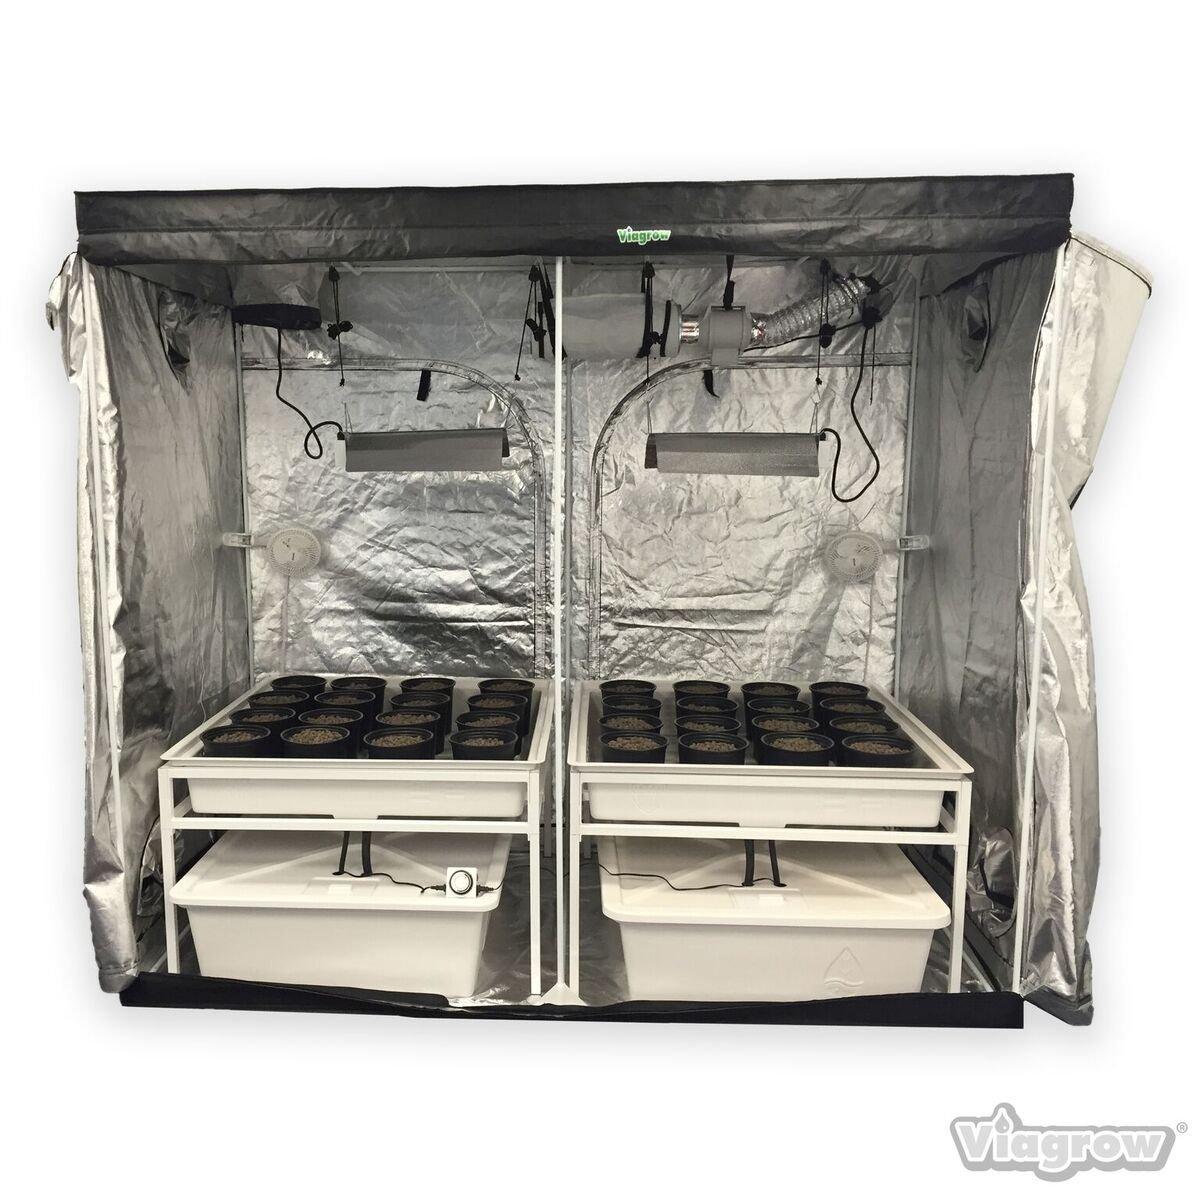 Viagrow Hydro Grow Room Deluxe, 4' x 8' x 7'